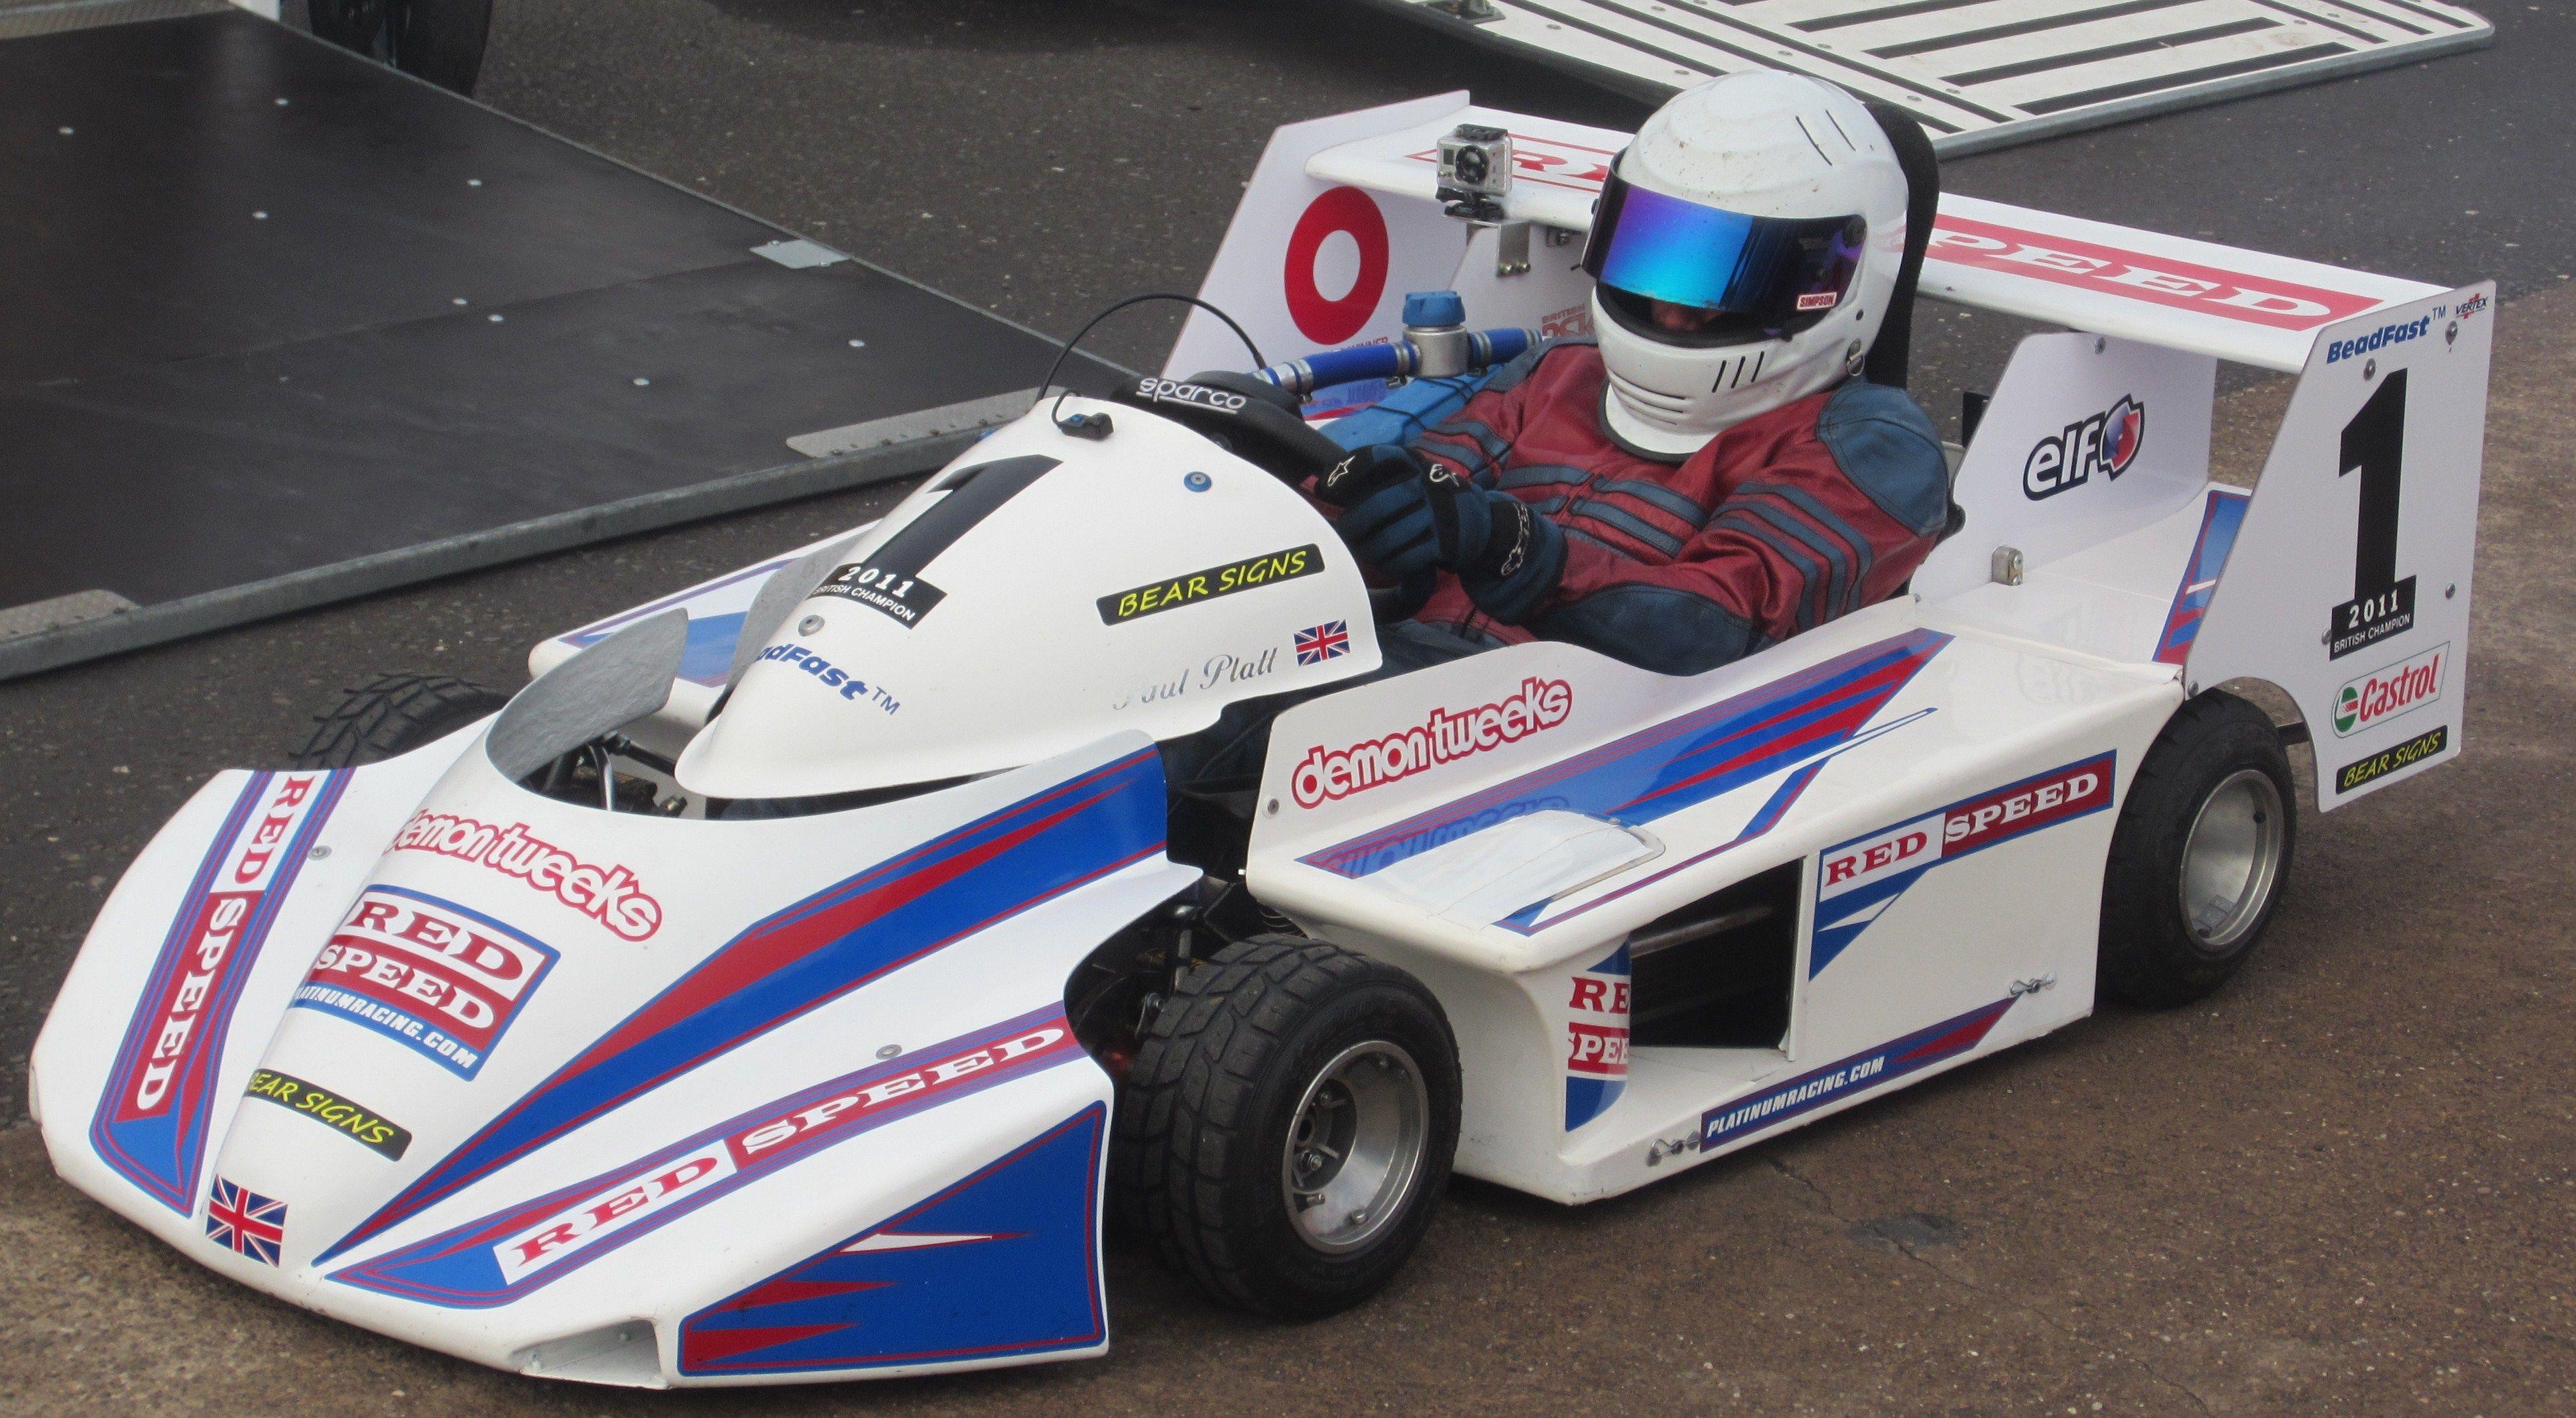 PVP/Honda (F250 National) (DP)   Go kart   Go kart, Karting, Mini bike